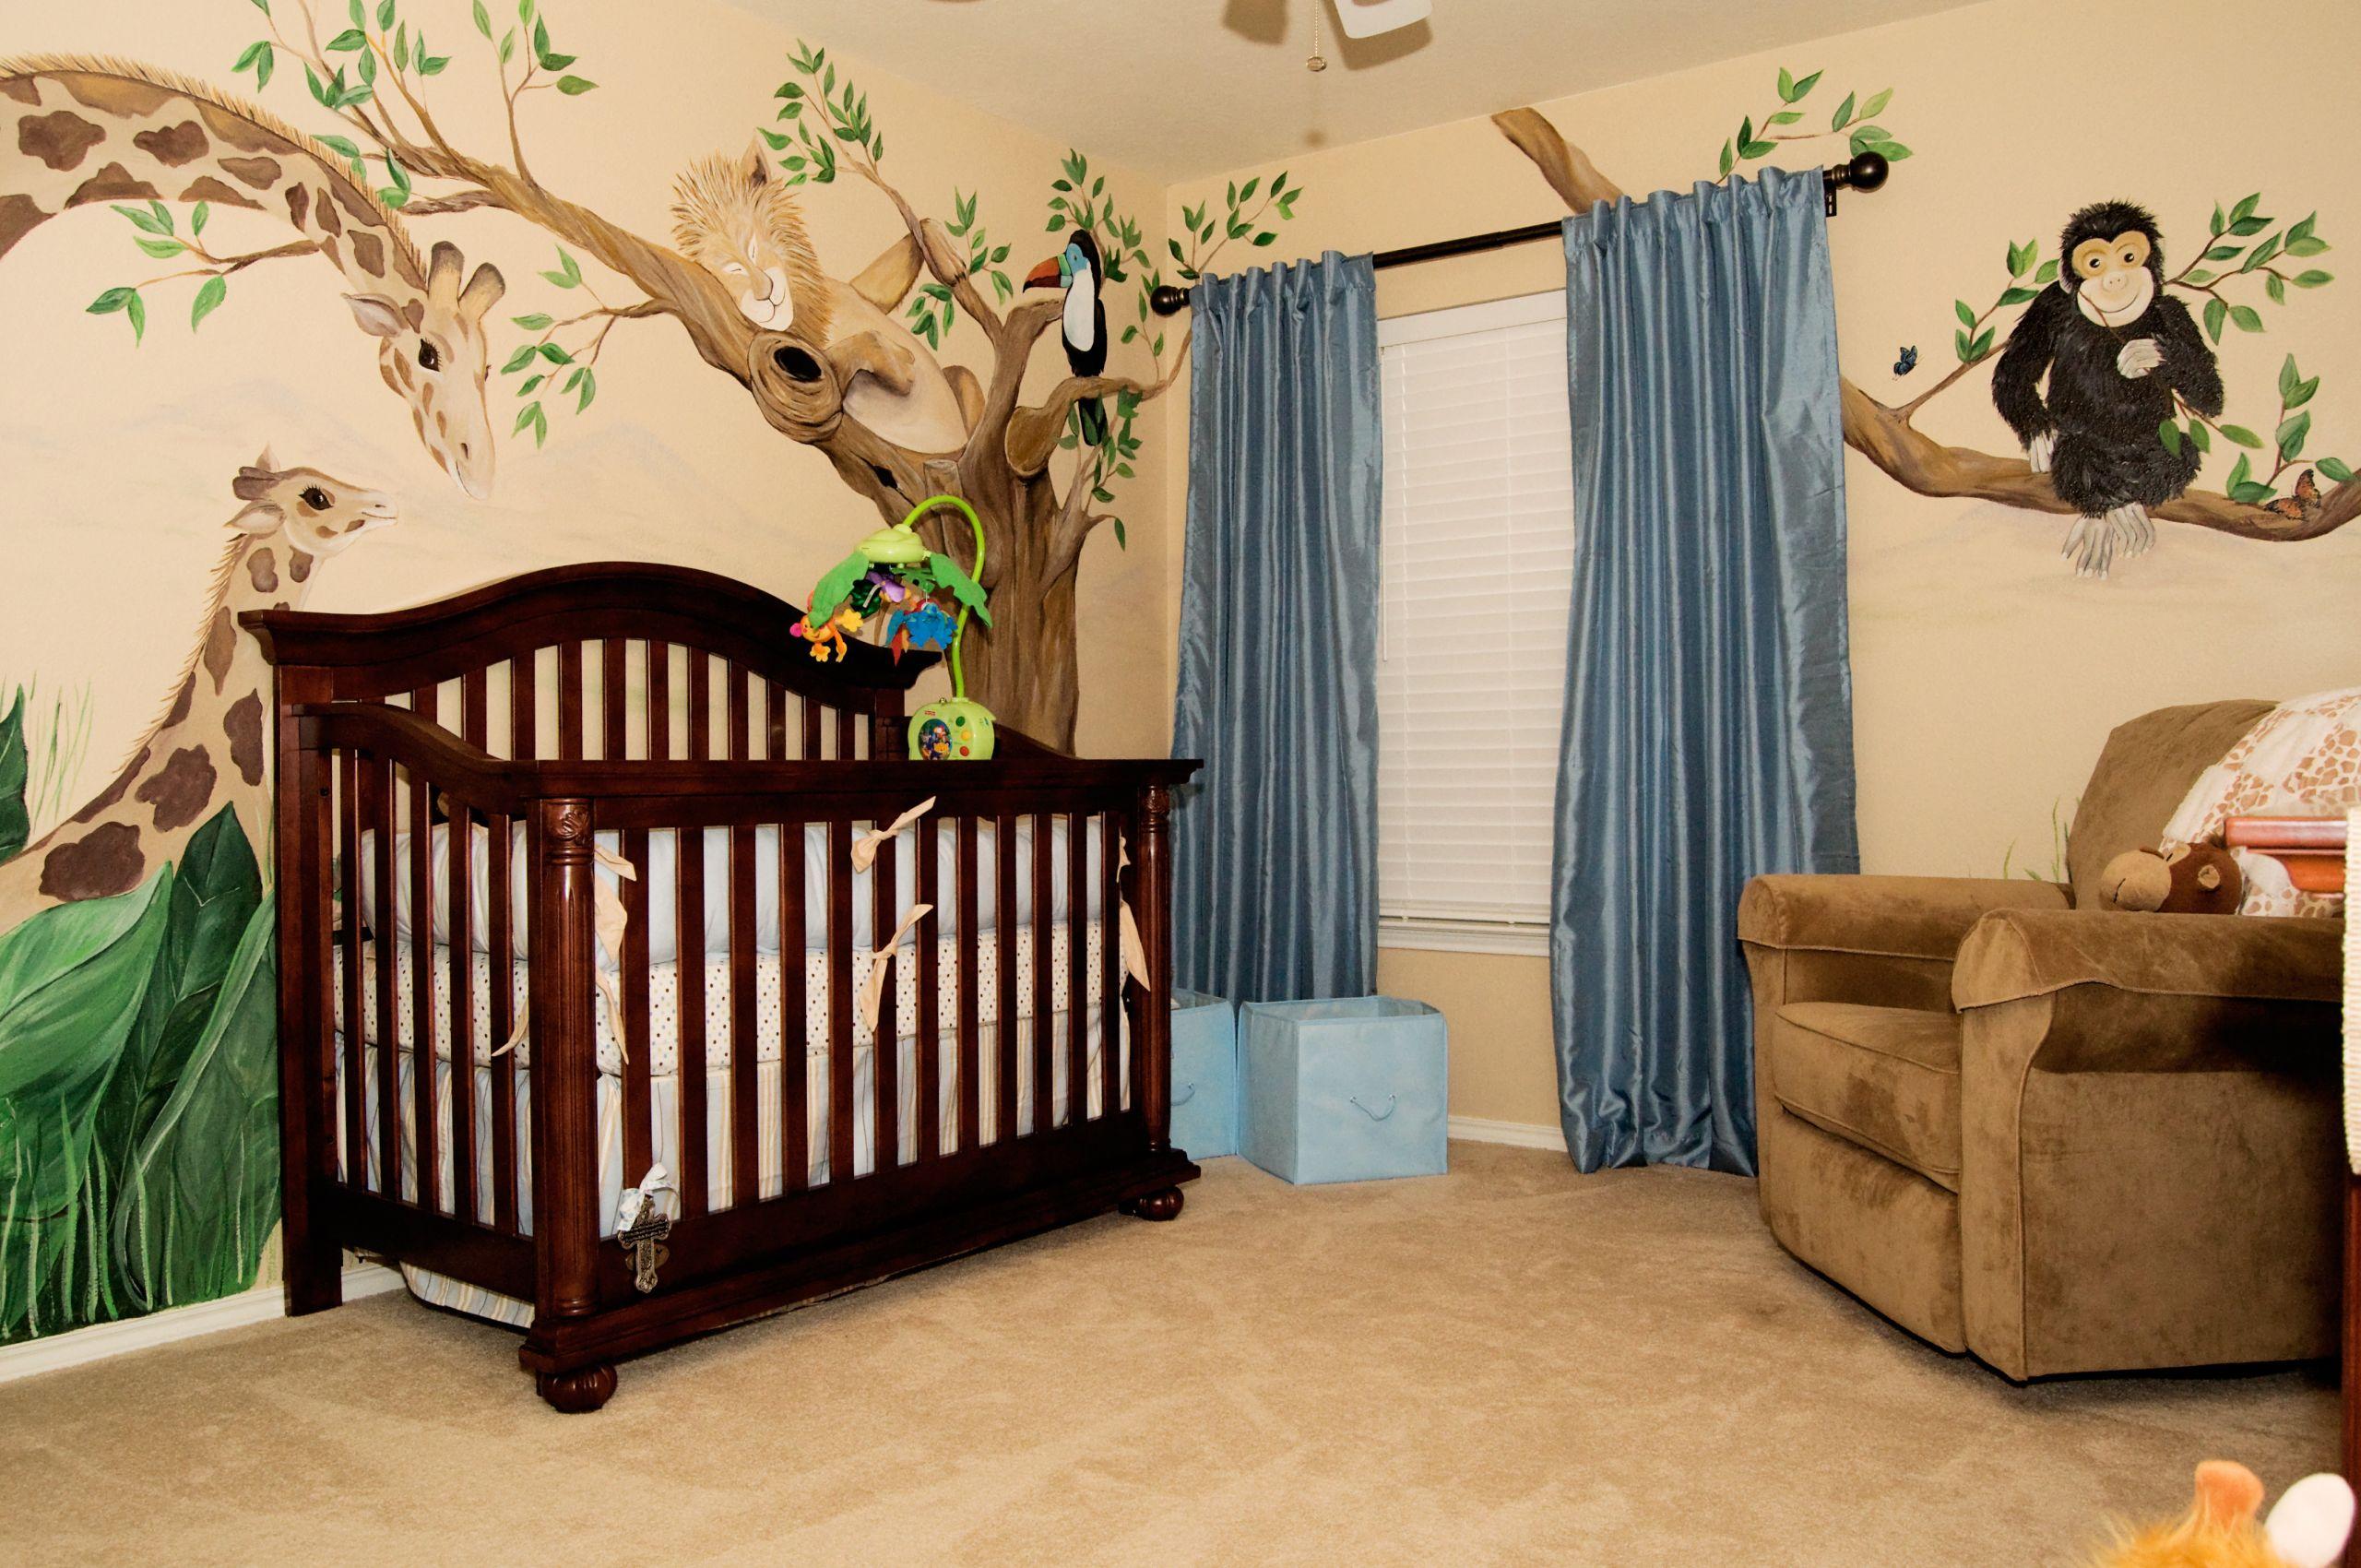 Jungle Baby Room Decor  Adorable Baby Room Décor Ideas